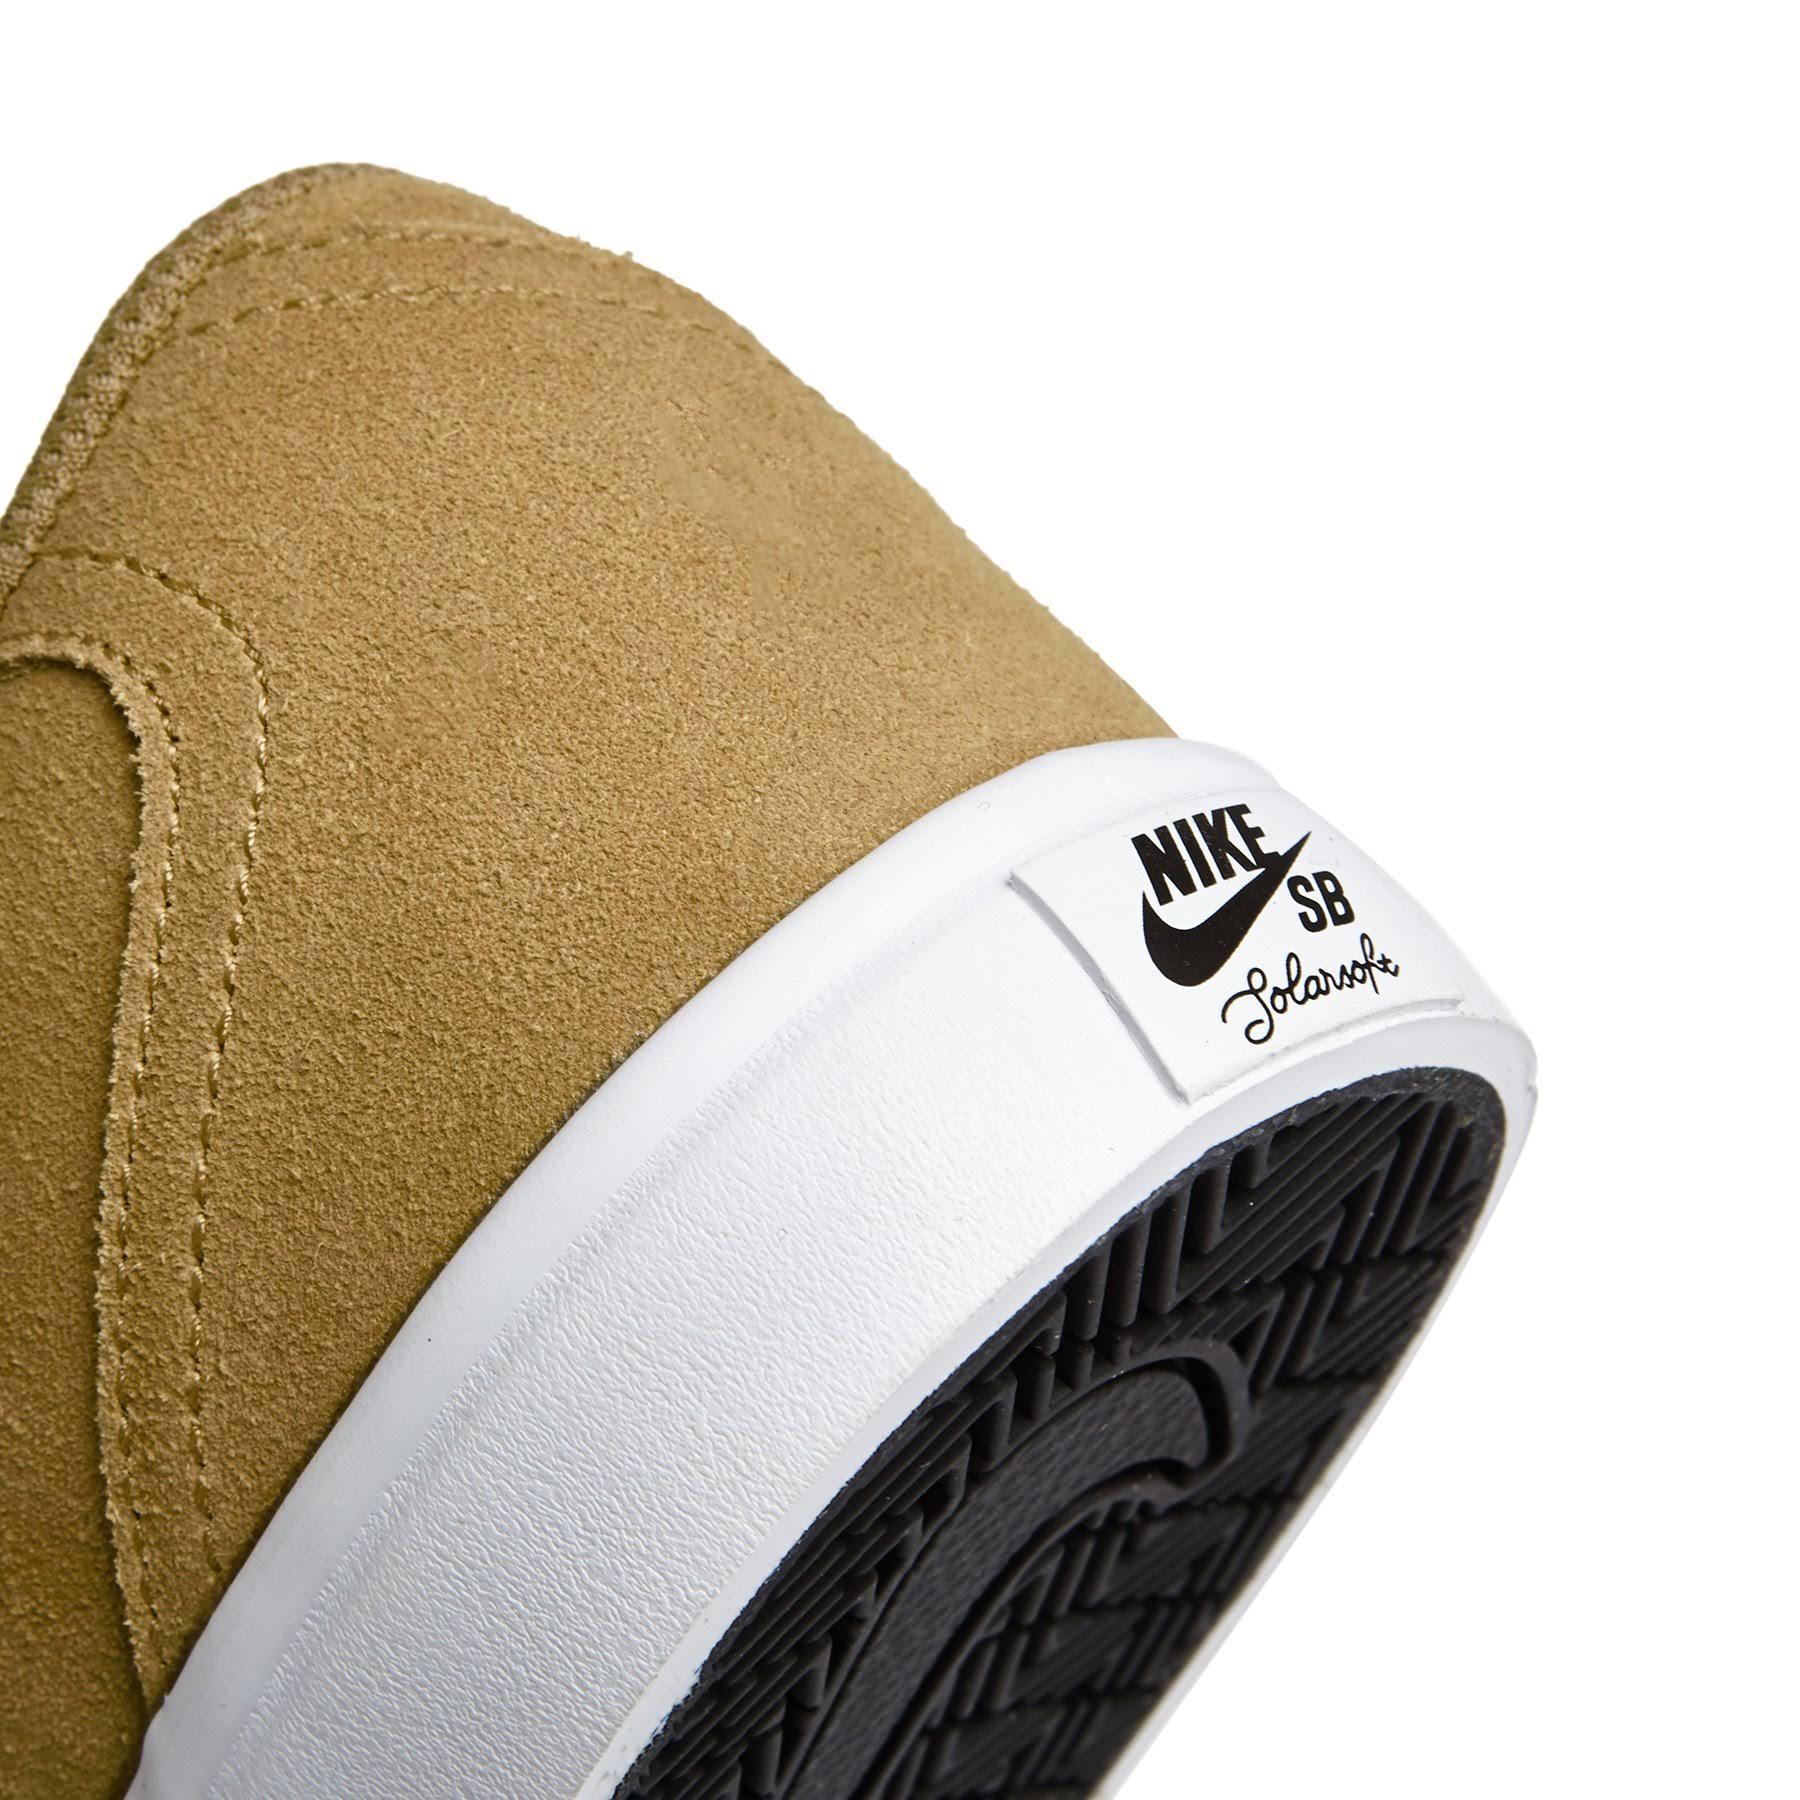 Nike 7 Sb Solar Check Us sQrChdxt